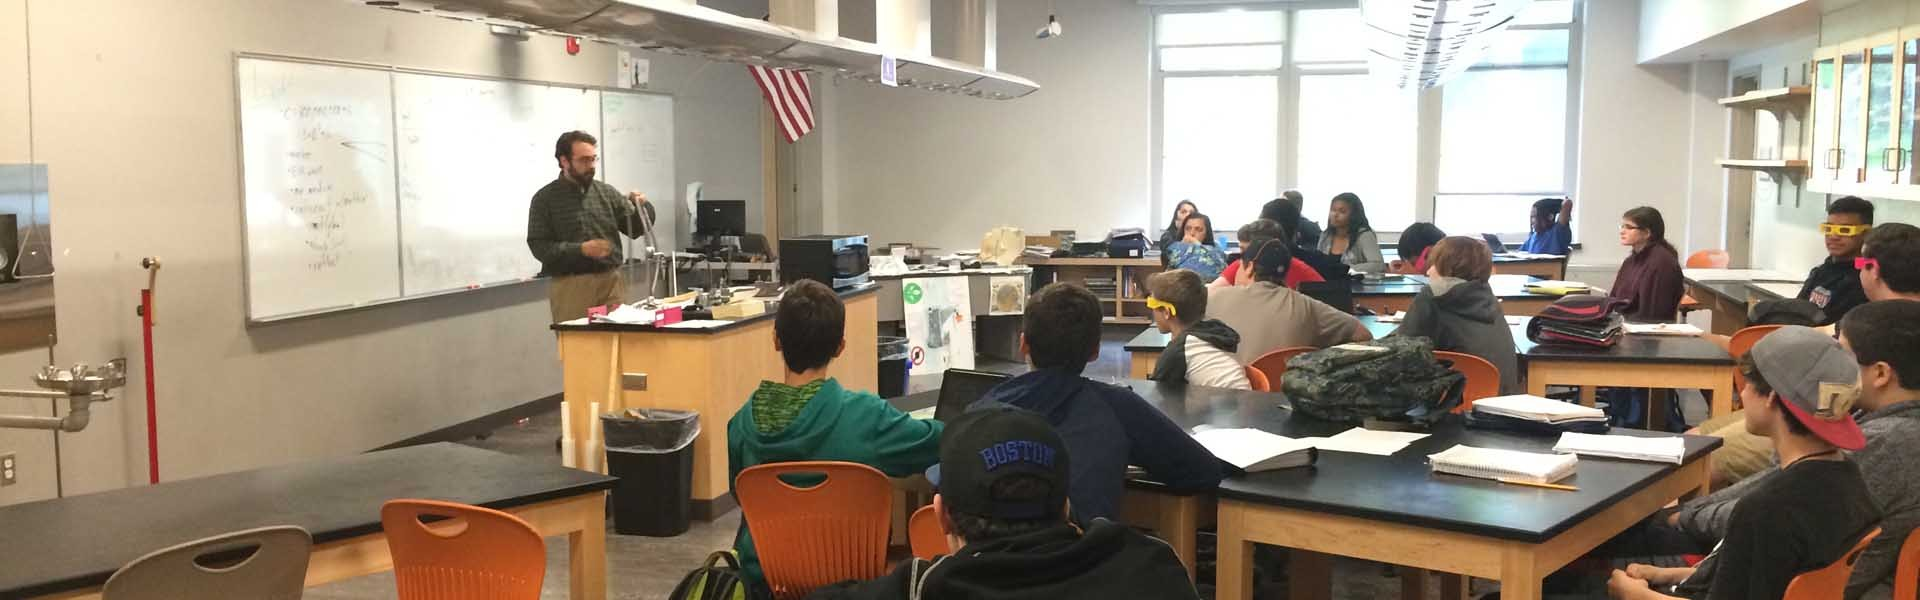 Maynard High School Massachusetts USA Classroom Banner 2019